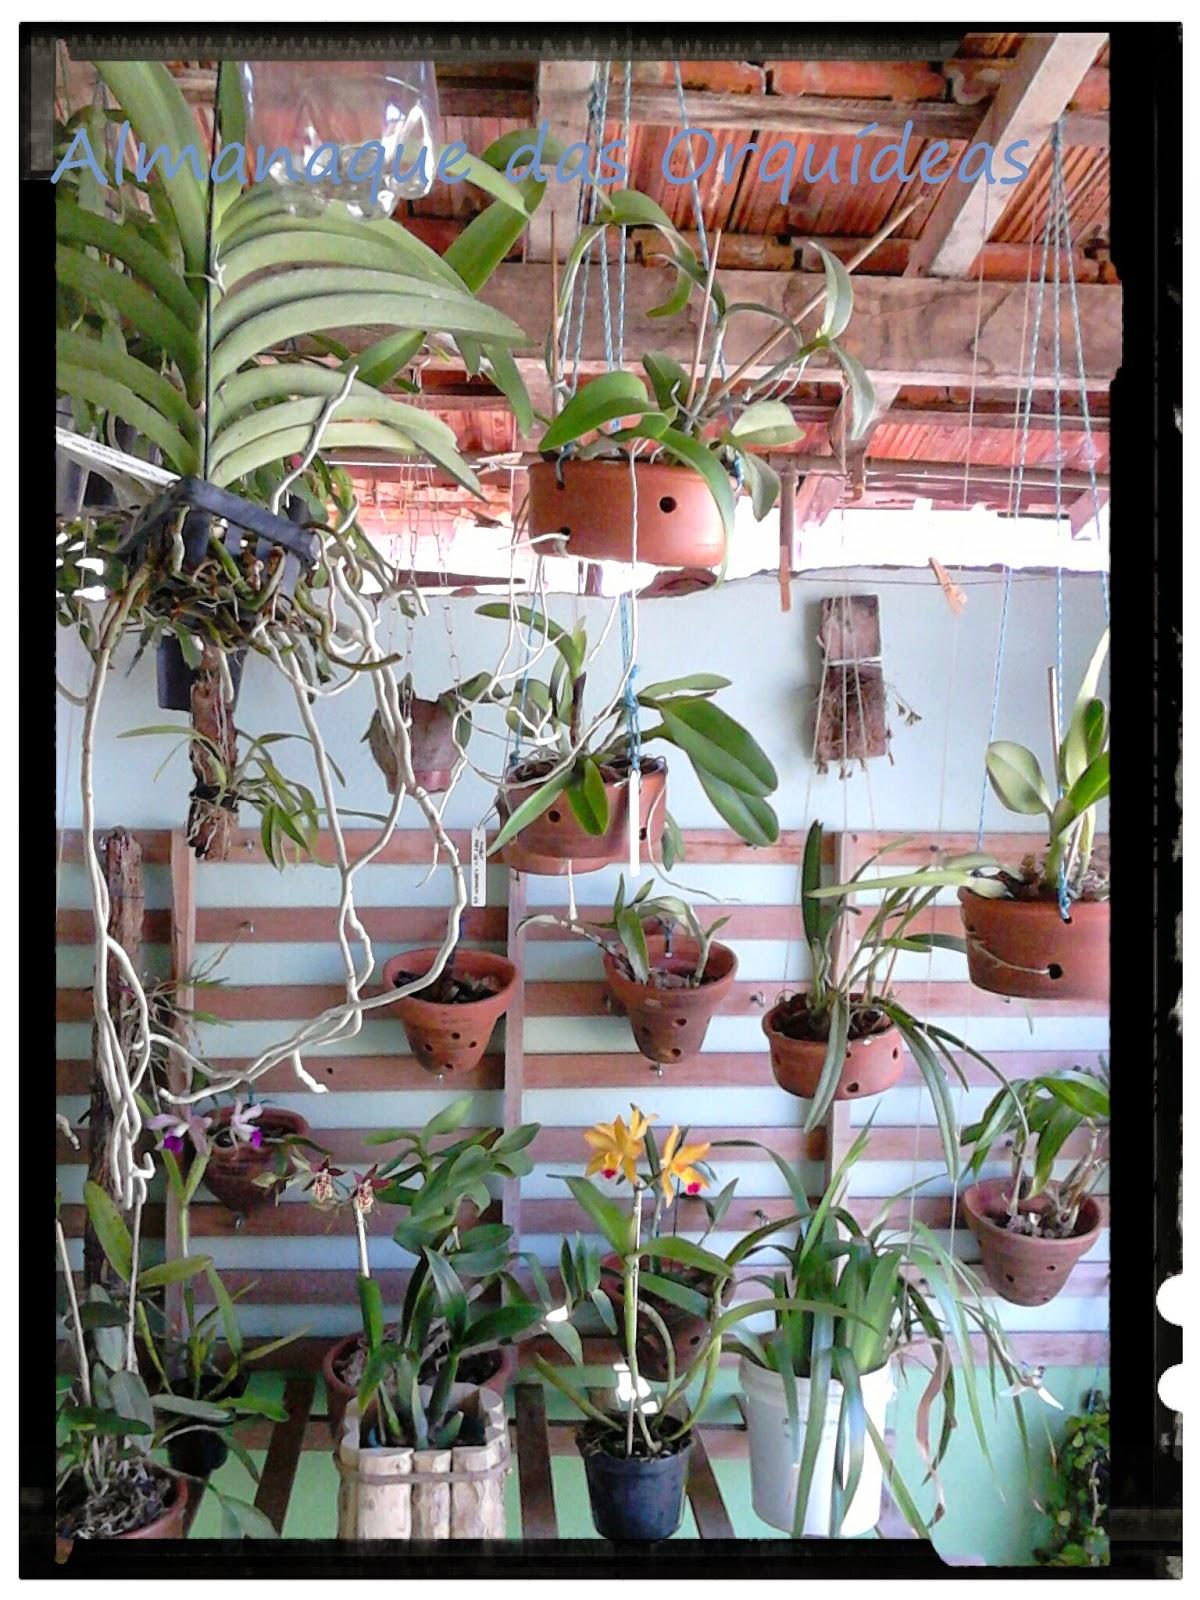 jardim vertical de orquideas : ALMANAQUE DAS ORQU?DEAS: Jardim vertical